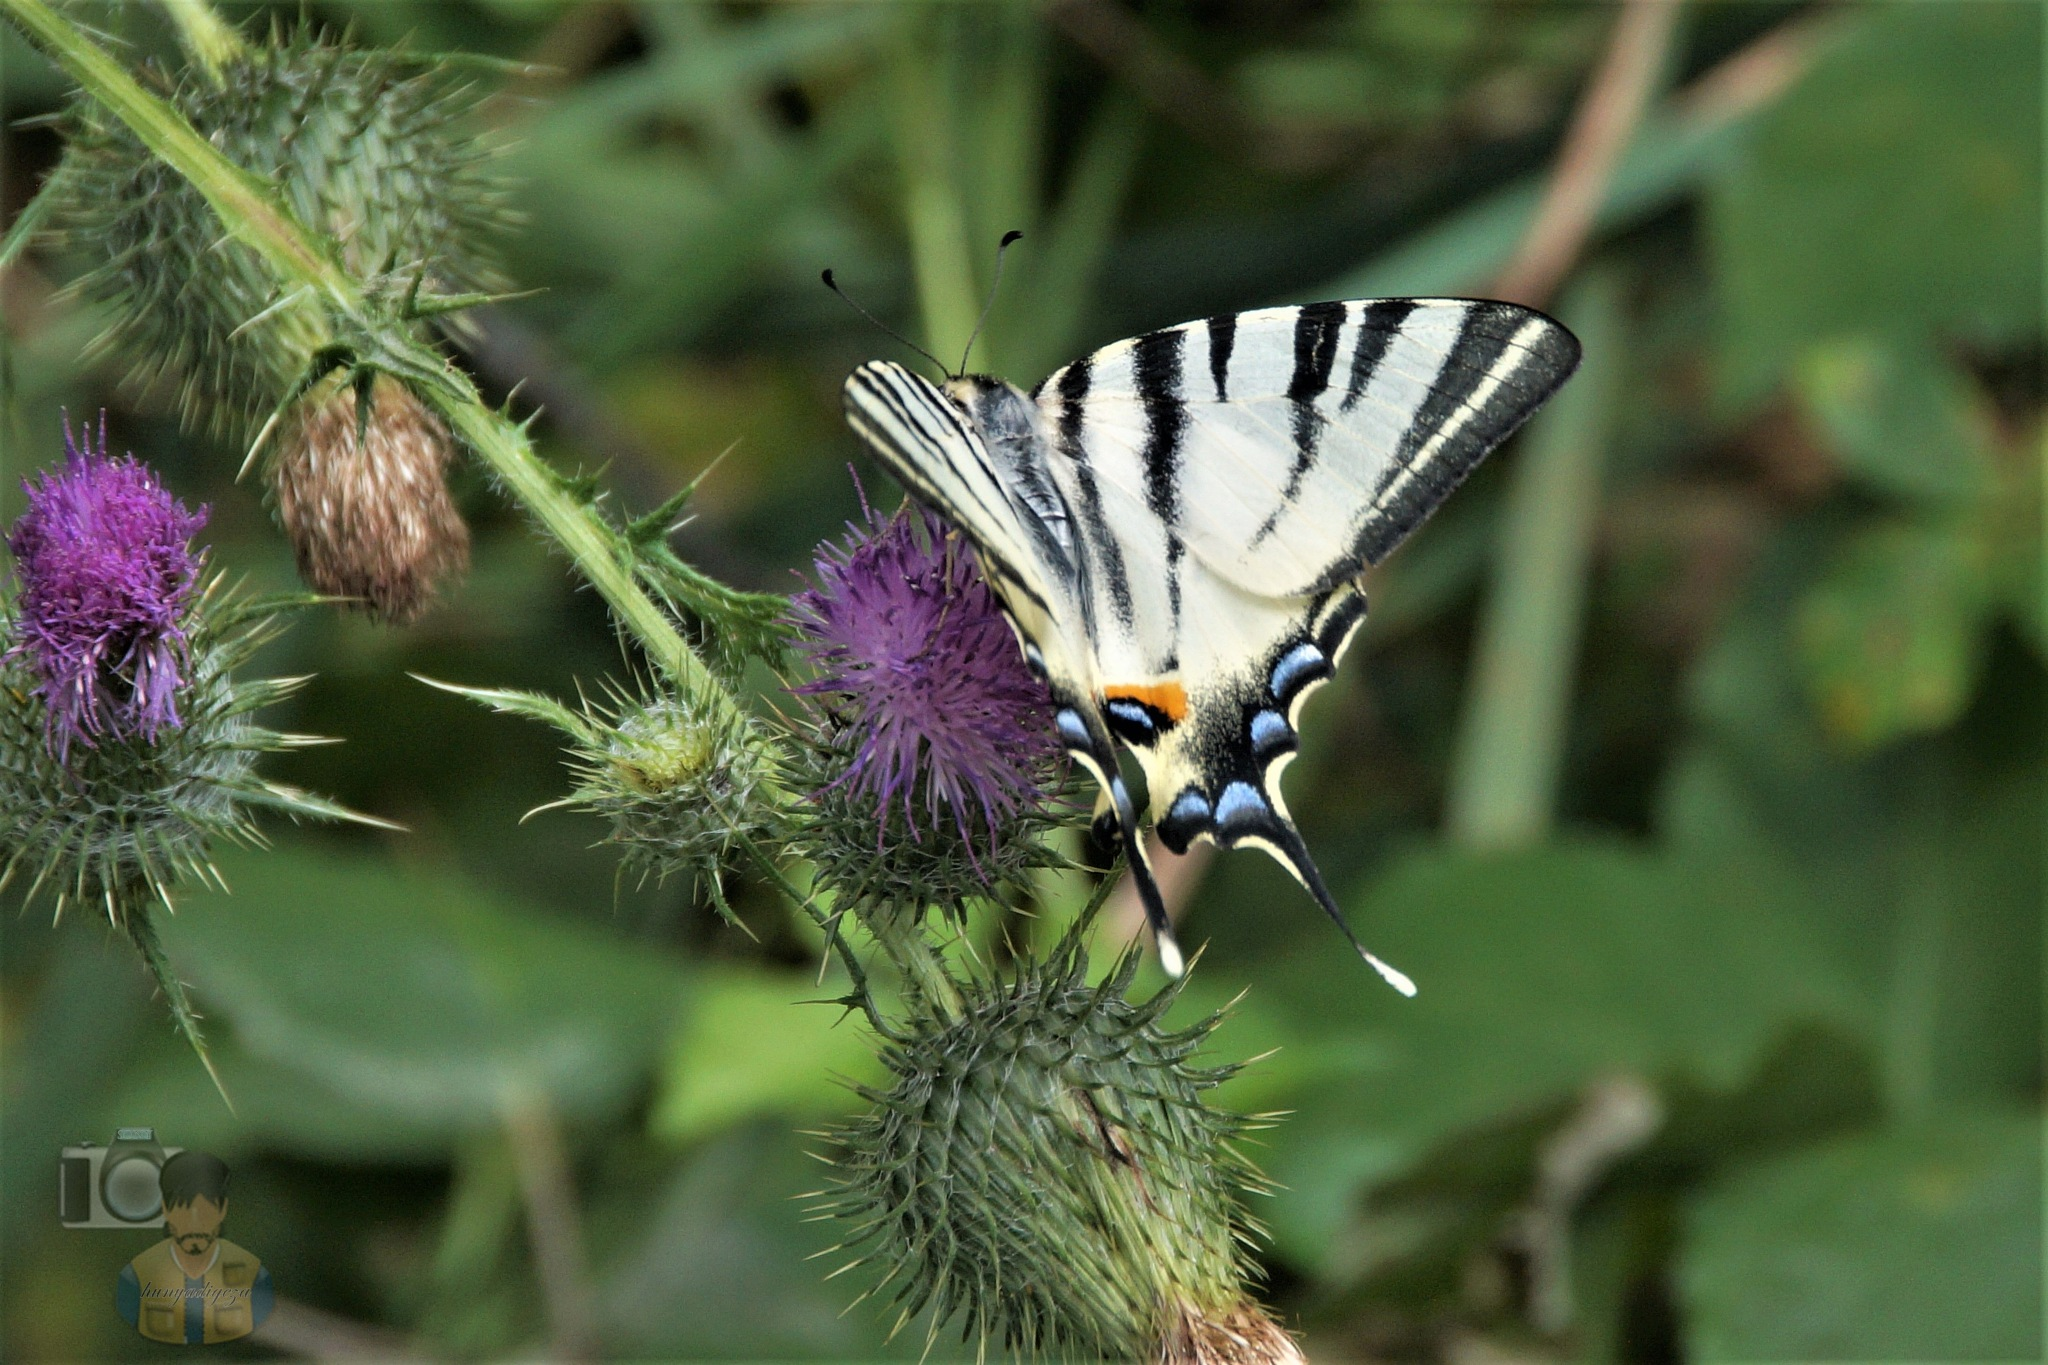 Aug.07, The scarce swallowtail #2 by hunyadigeza